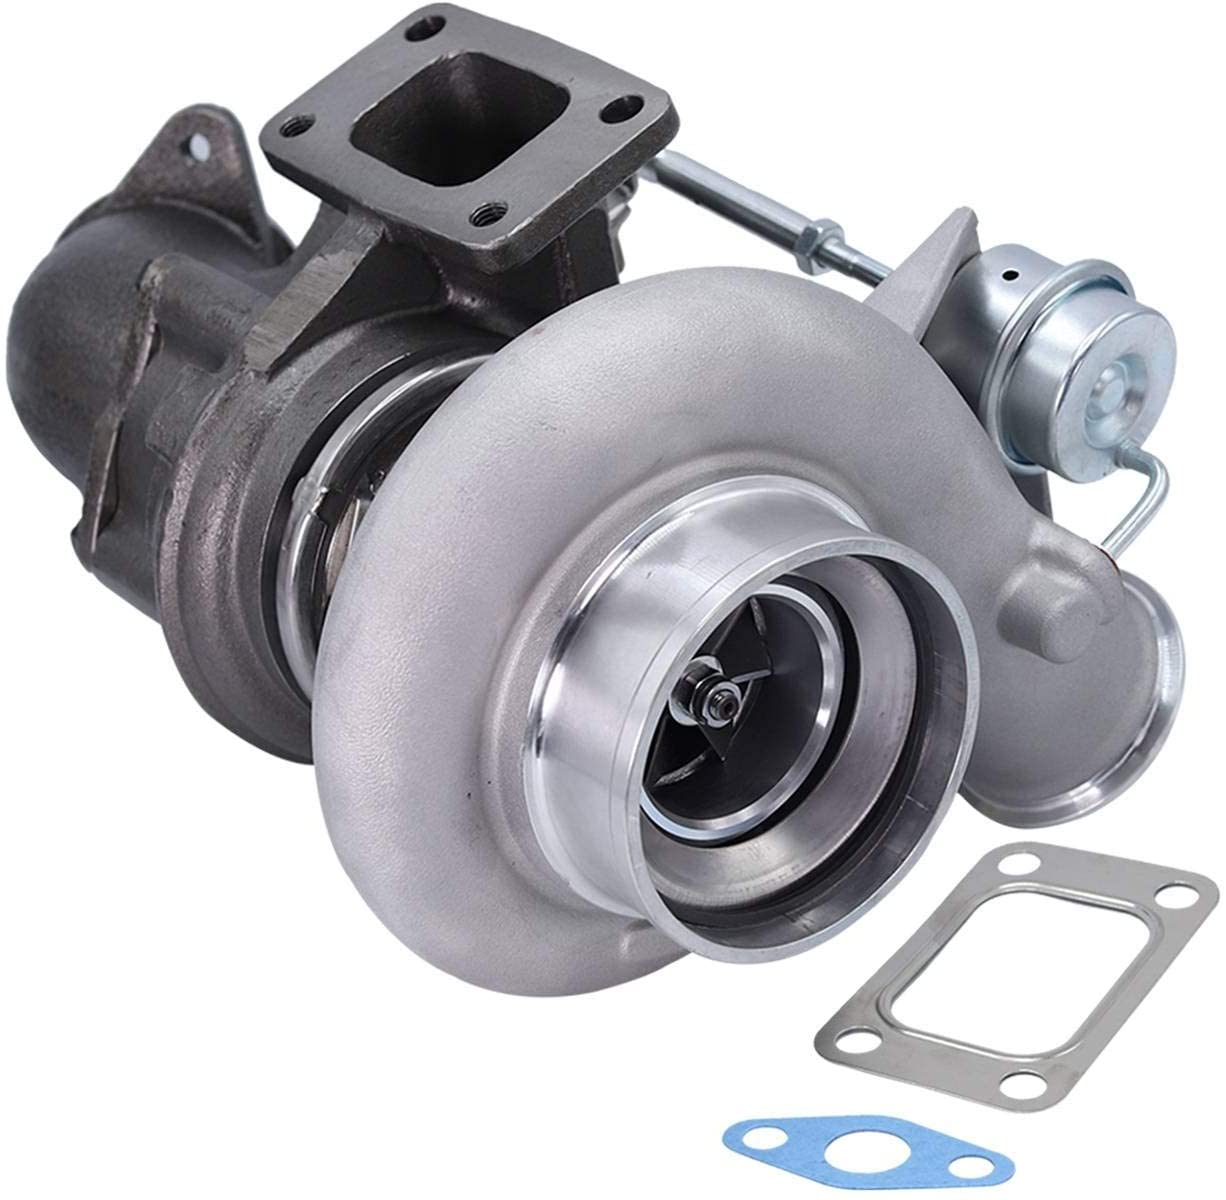 Bapmic 3592836 Turbo Charger Turbocharger HY35W for 2000-2002 Dodge RAM 2500 3500 6BTA 215HP 5.9L Diesel